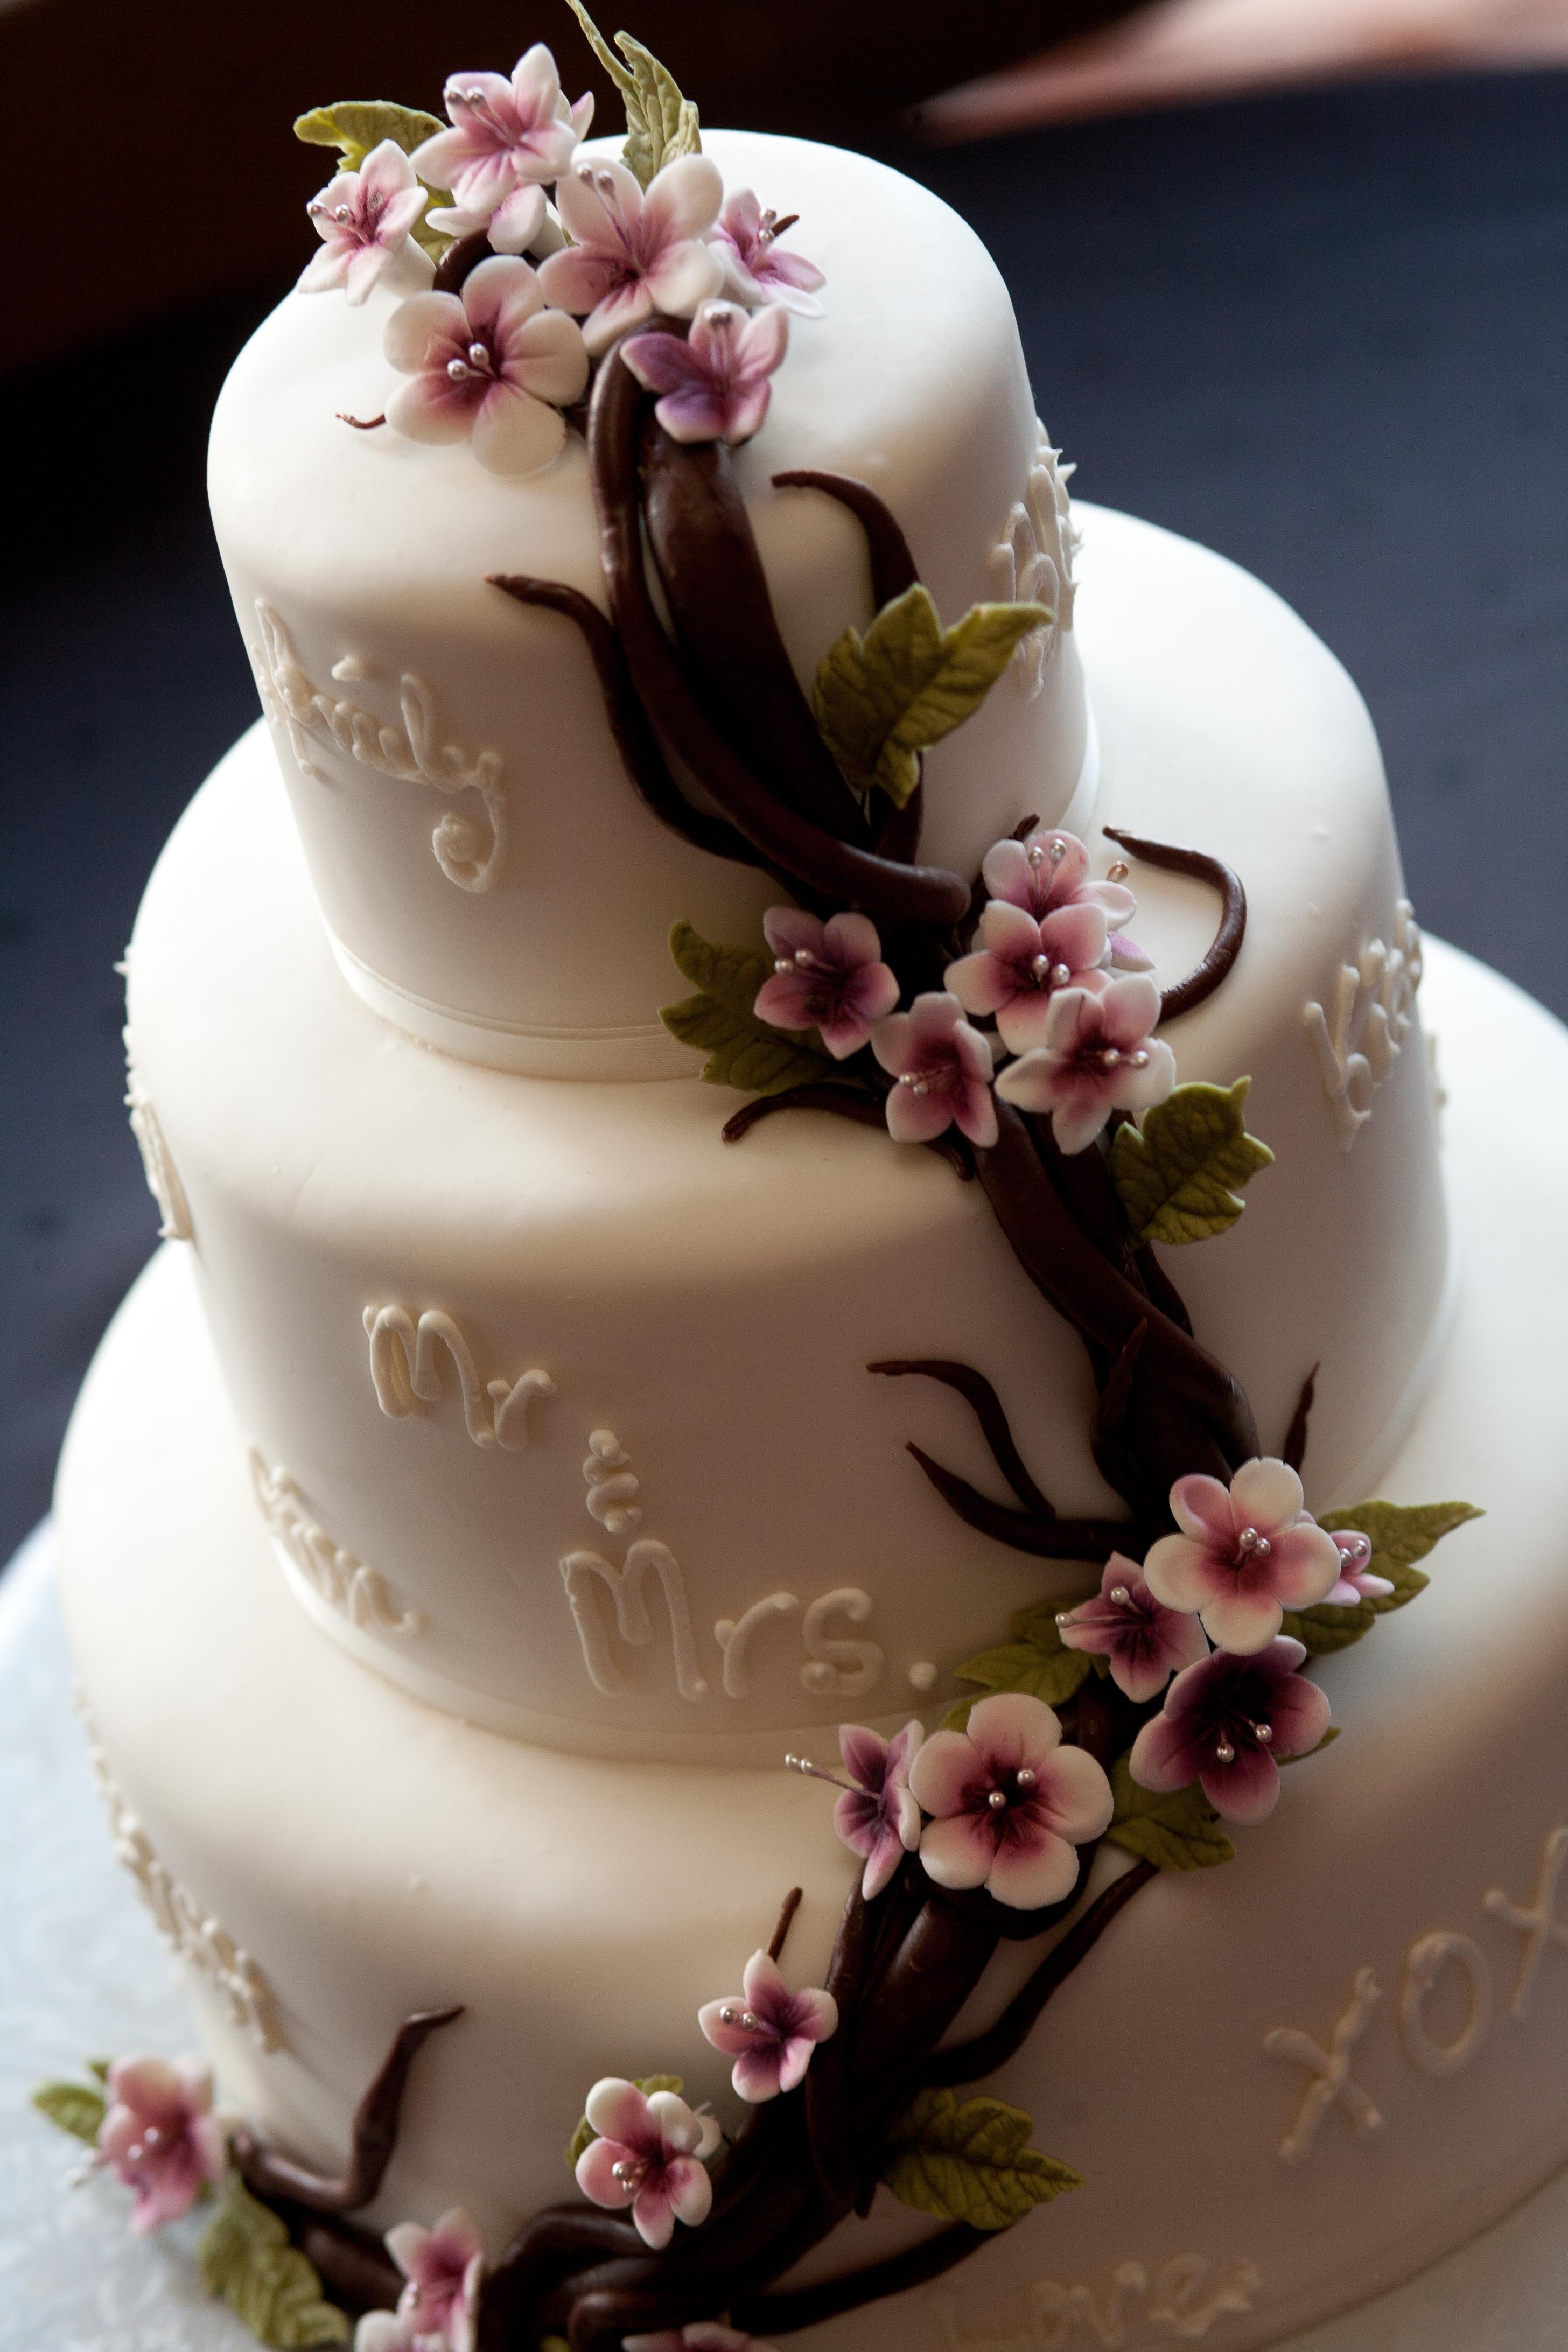 weddings at poco the perfect wedding cake weddings at poco